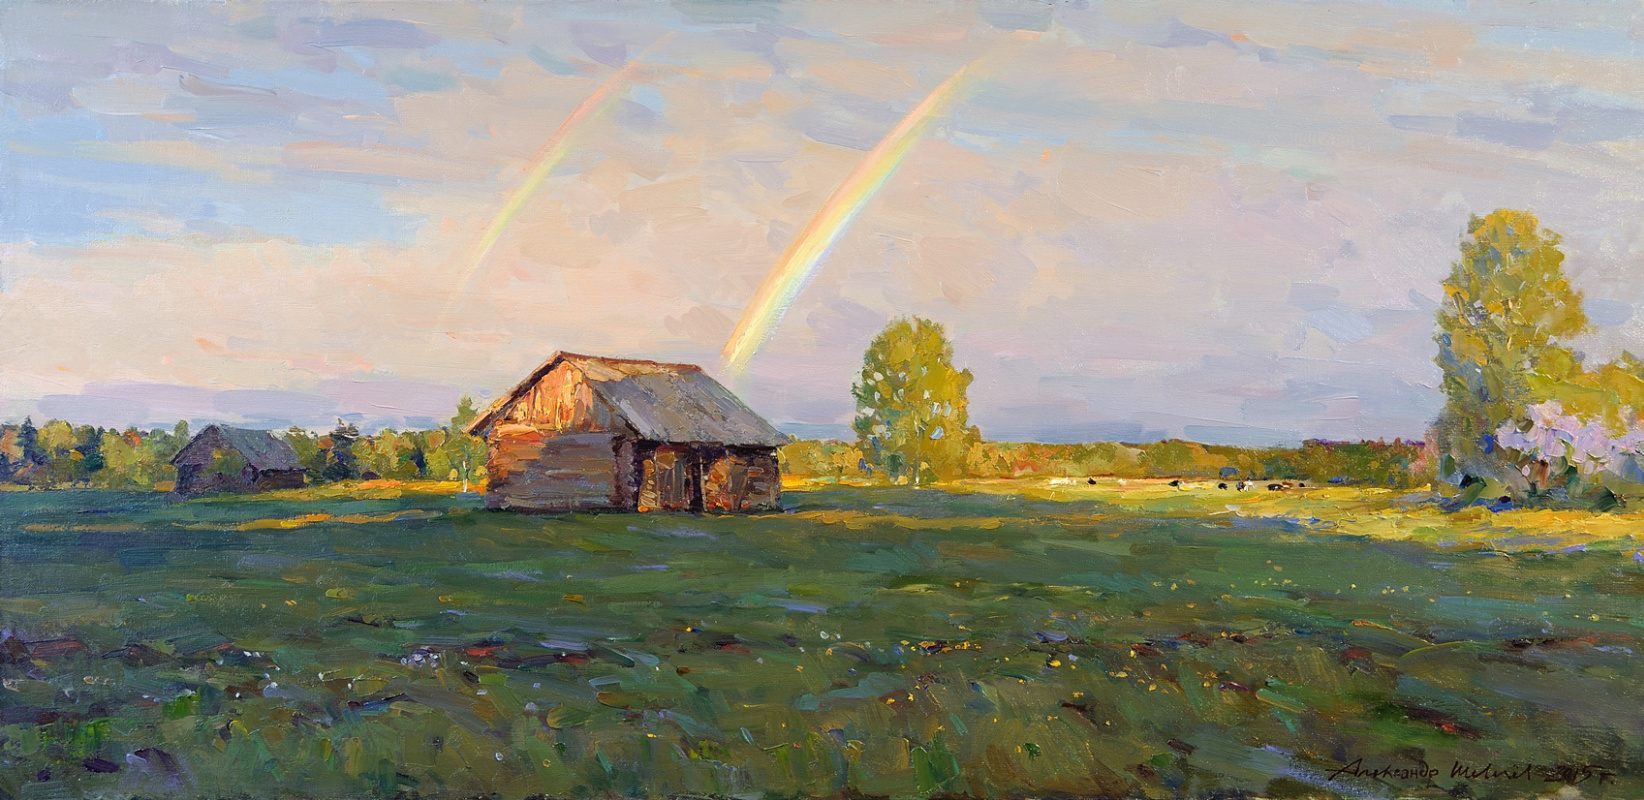 Alexander Shevelyov. Summer evening. Oil on canvas 52.7 x 110 cm. 2015